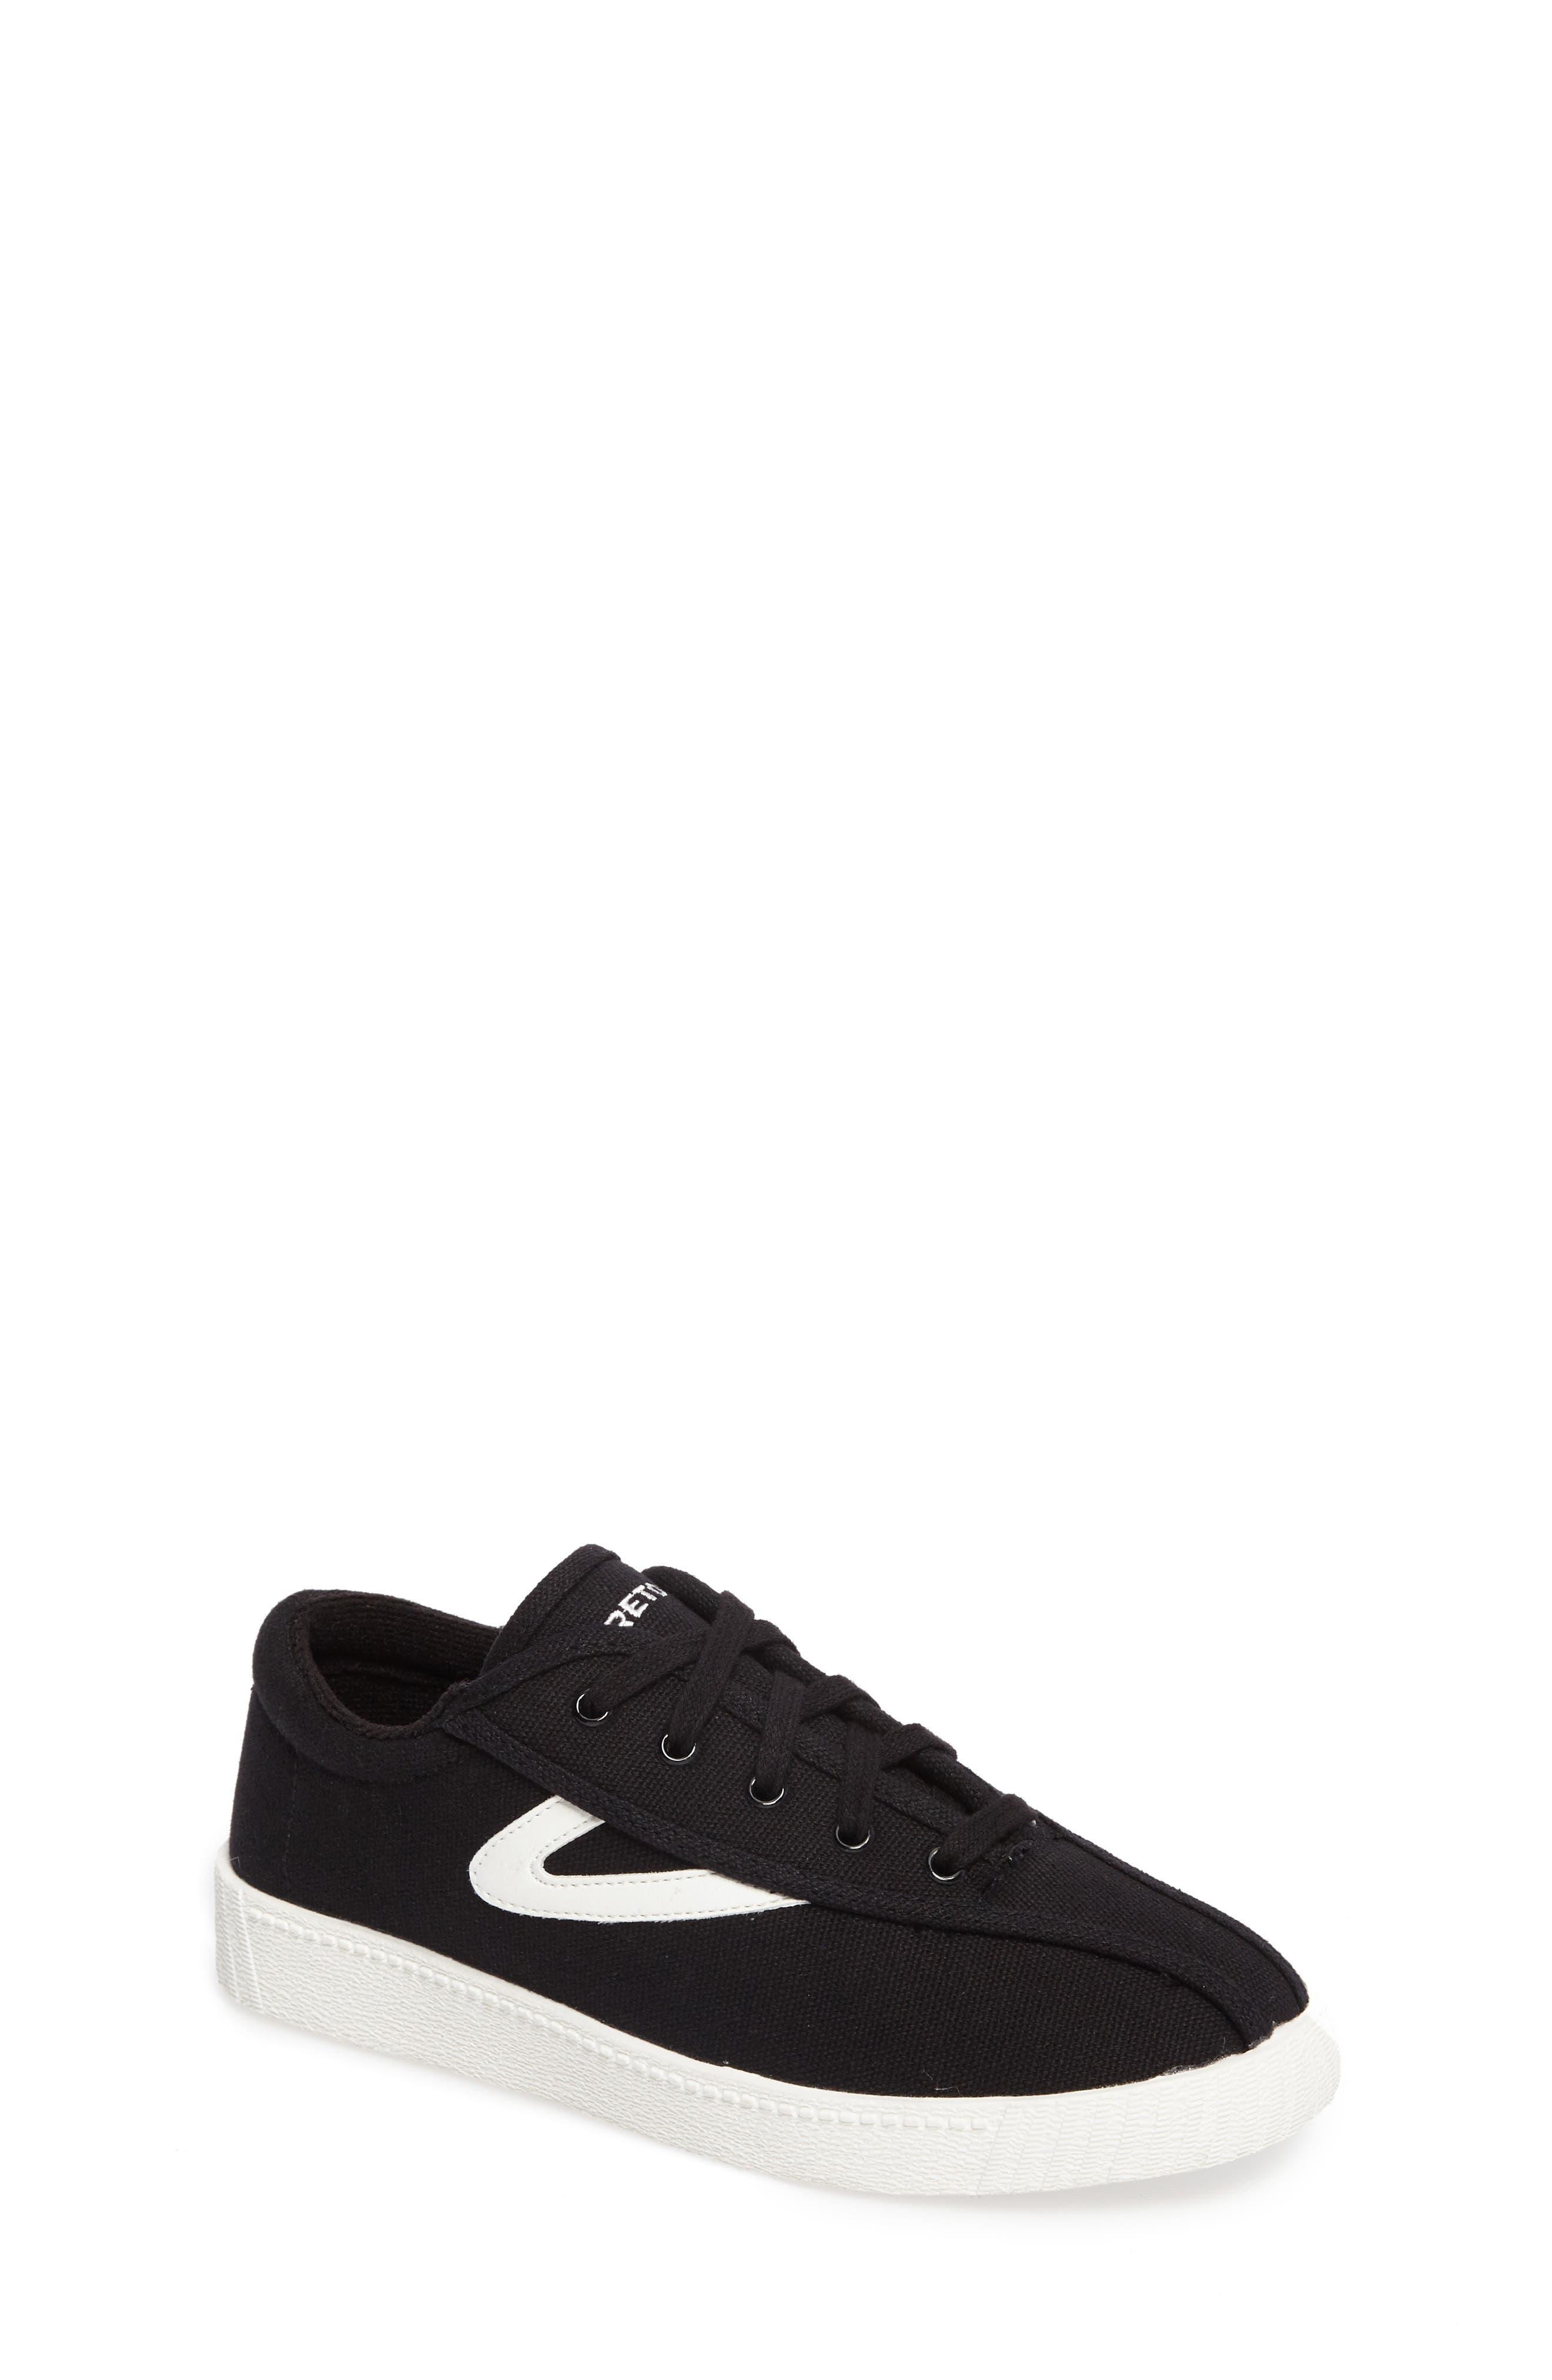 Nylite Plus Sneaker,                         Main,                         color,